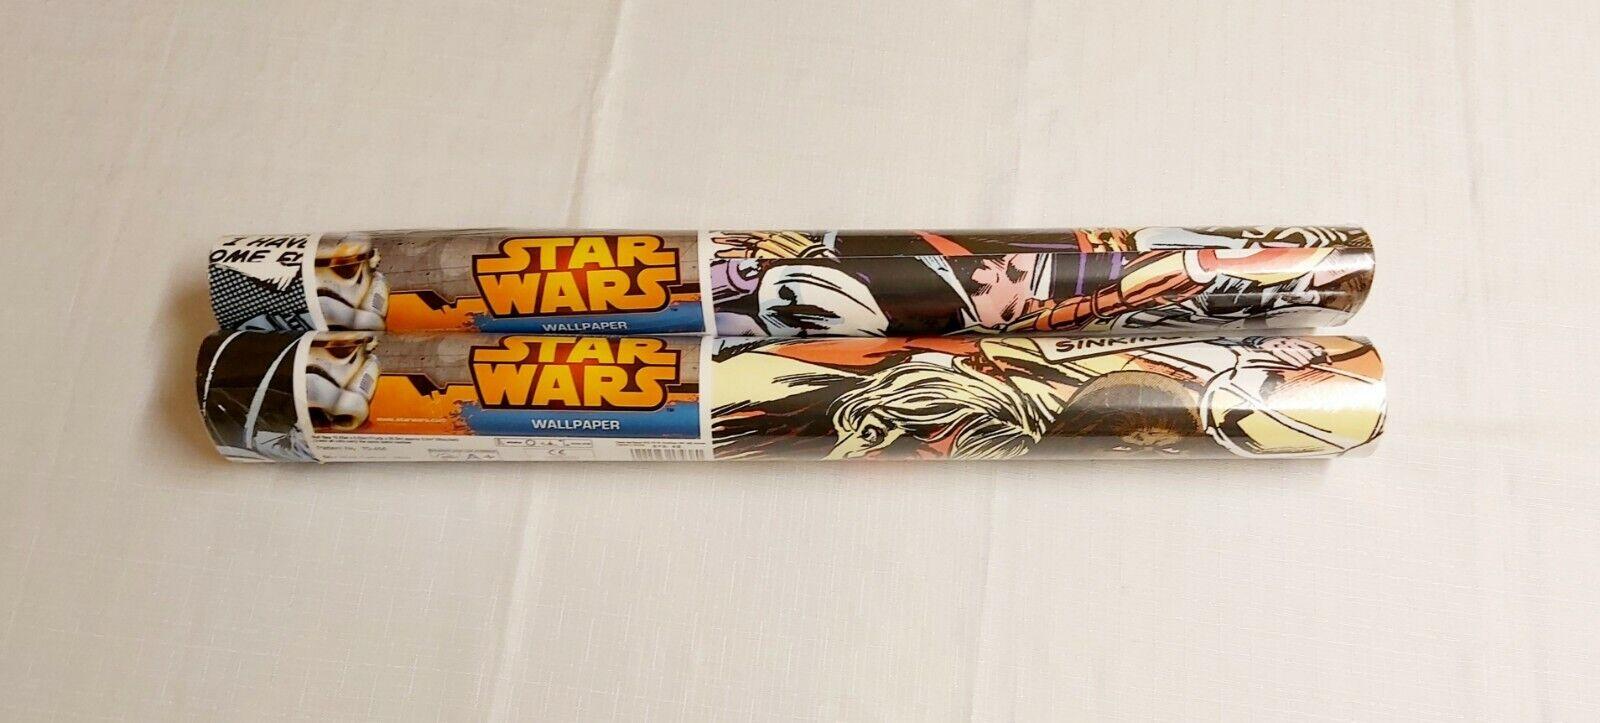 2 Rolls Of Star Wars Wallpaper Graham Brown Pattern 70 456 For Sale